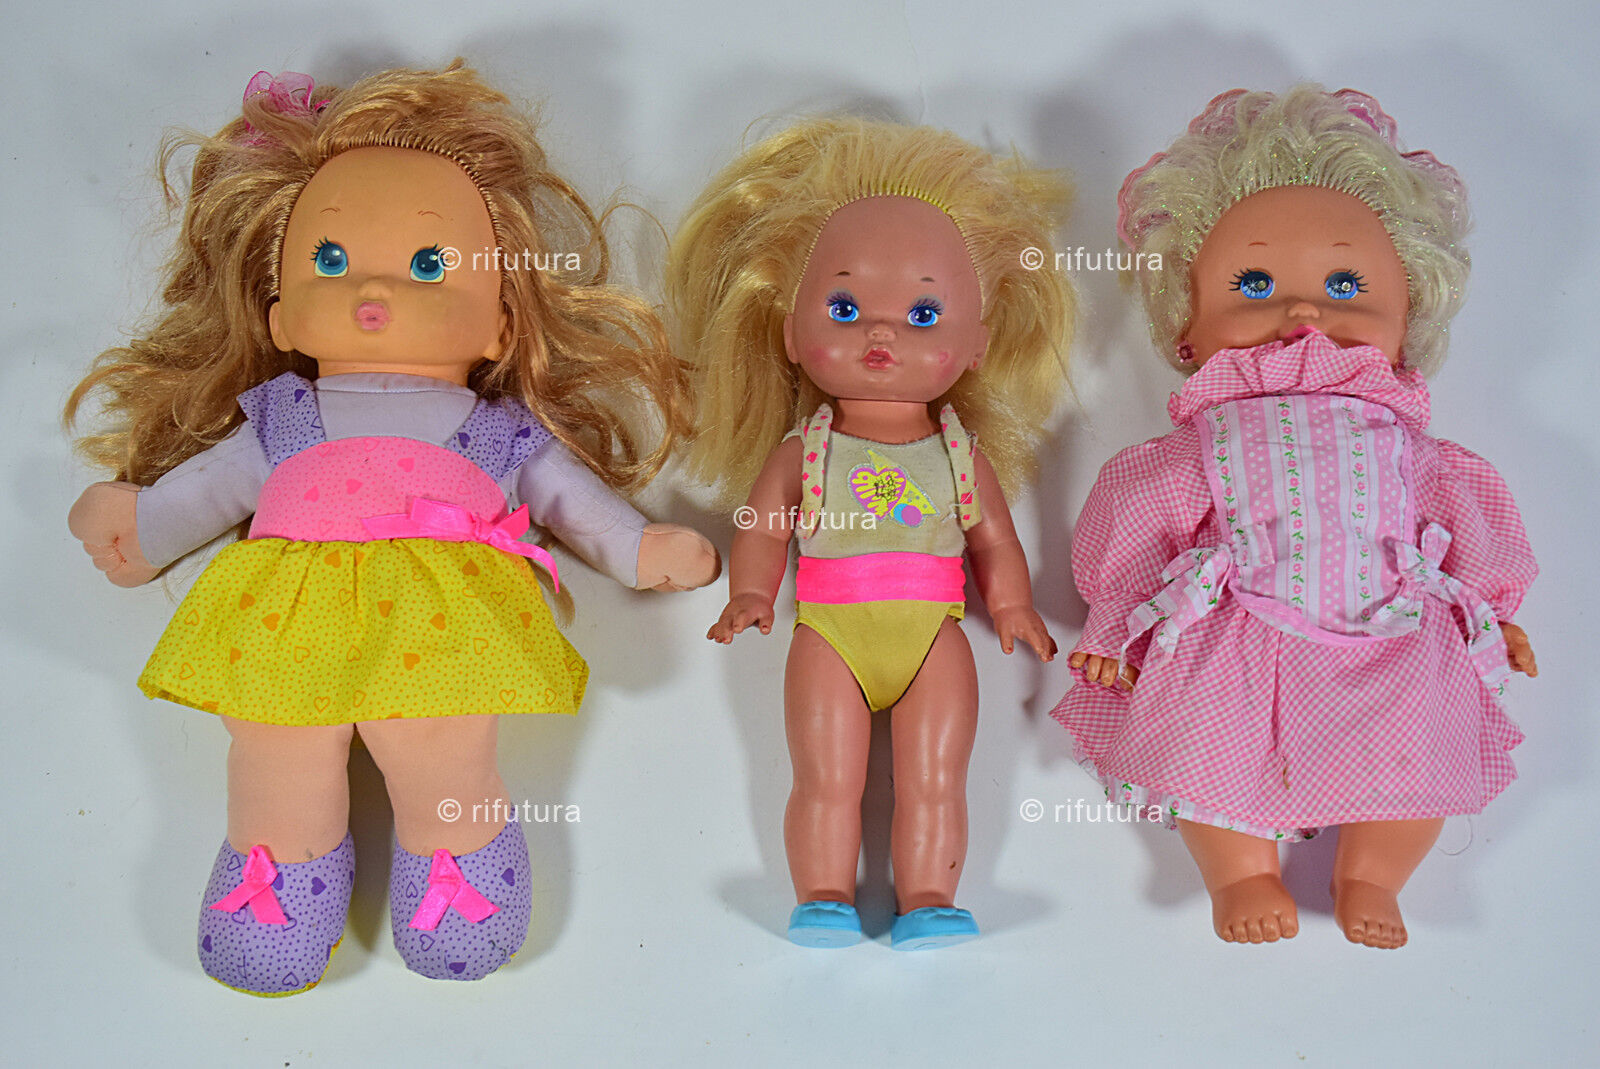 Lotto Bambole Cap Toys 1993 Mattel  BabyTwinkles+ Miss Make UP  H38/33/36cm-1S3